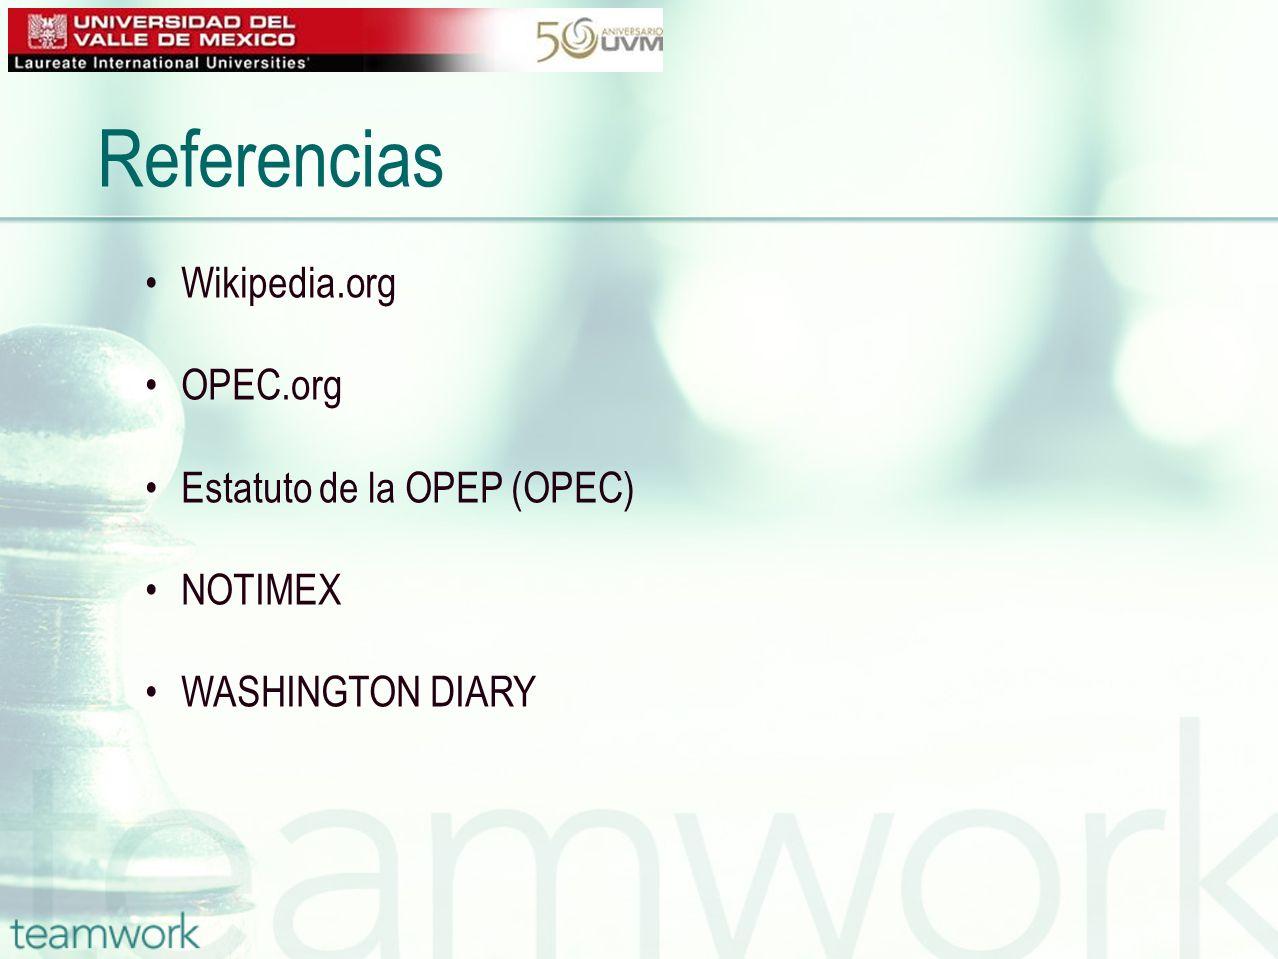 Referencias Wikipedia.org OPEC.org Estatuto de la OPEP (OPEC) NOTIMEX WASHINGTON DIARY